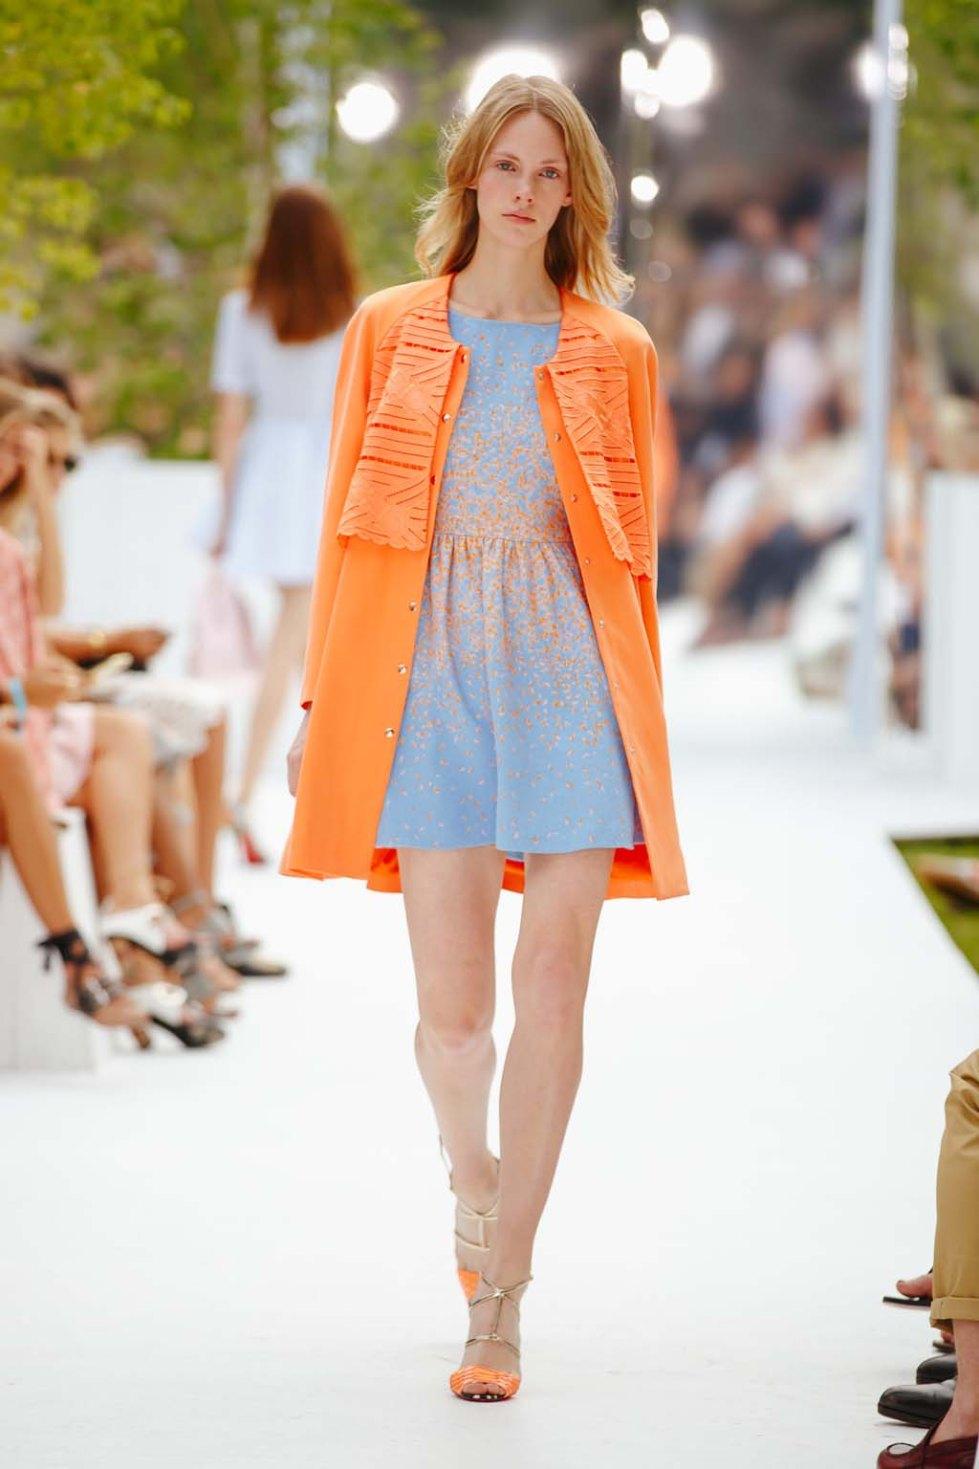 Marina-Hoermanseder -spring-2017-collection-slashitmag-fashion-7